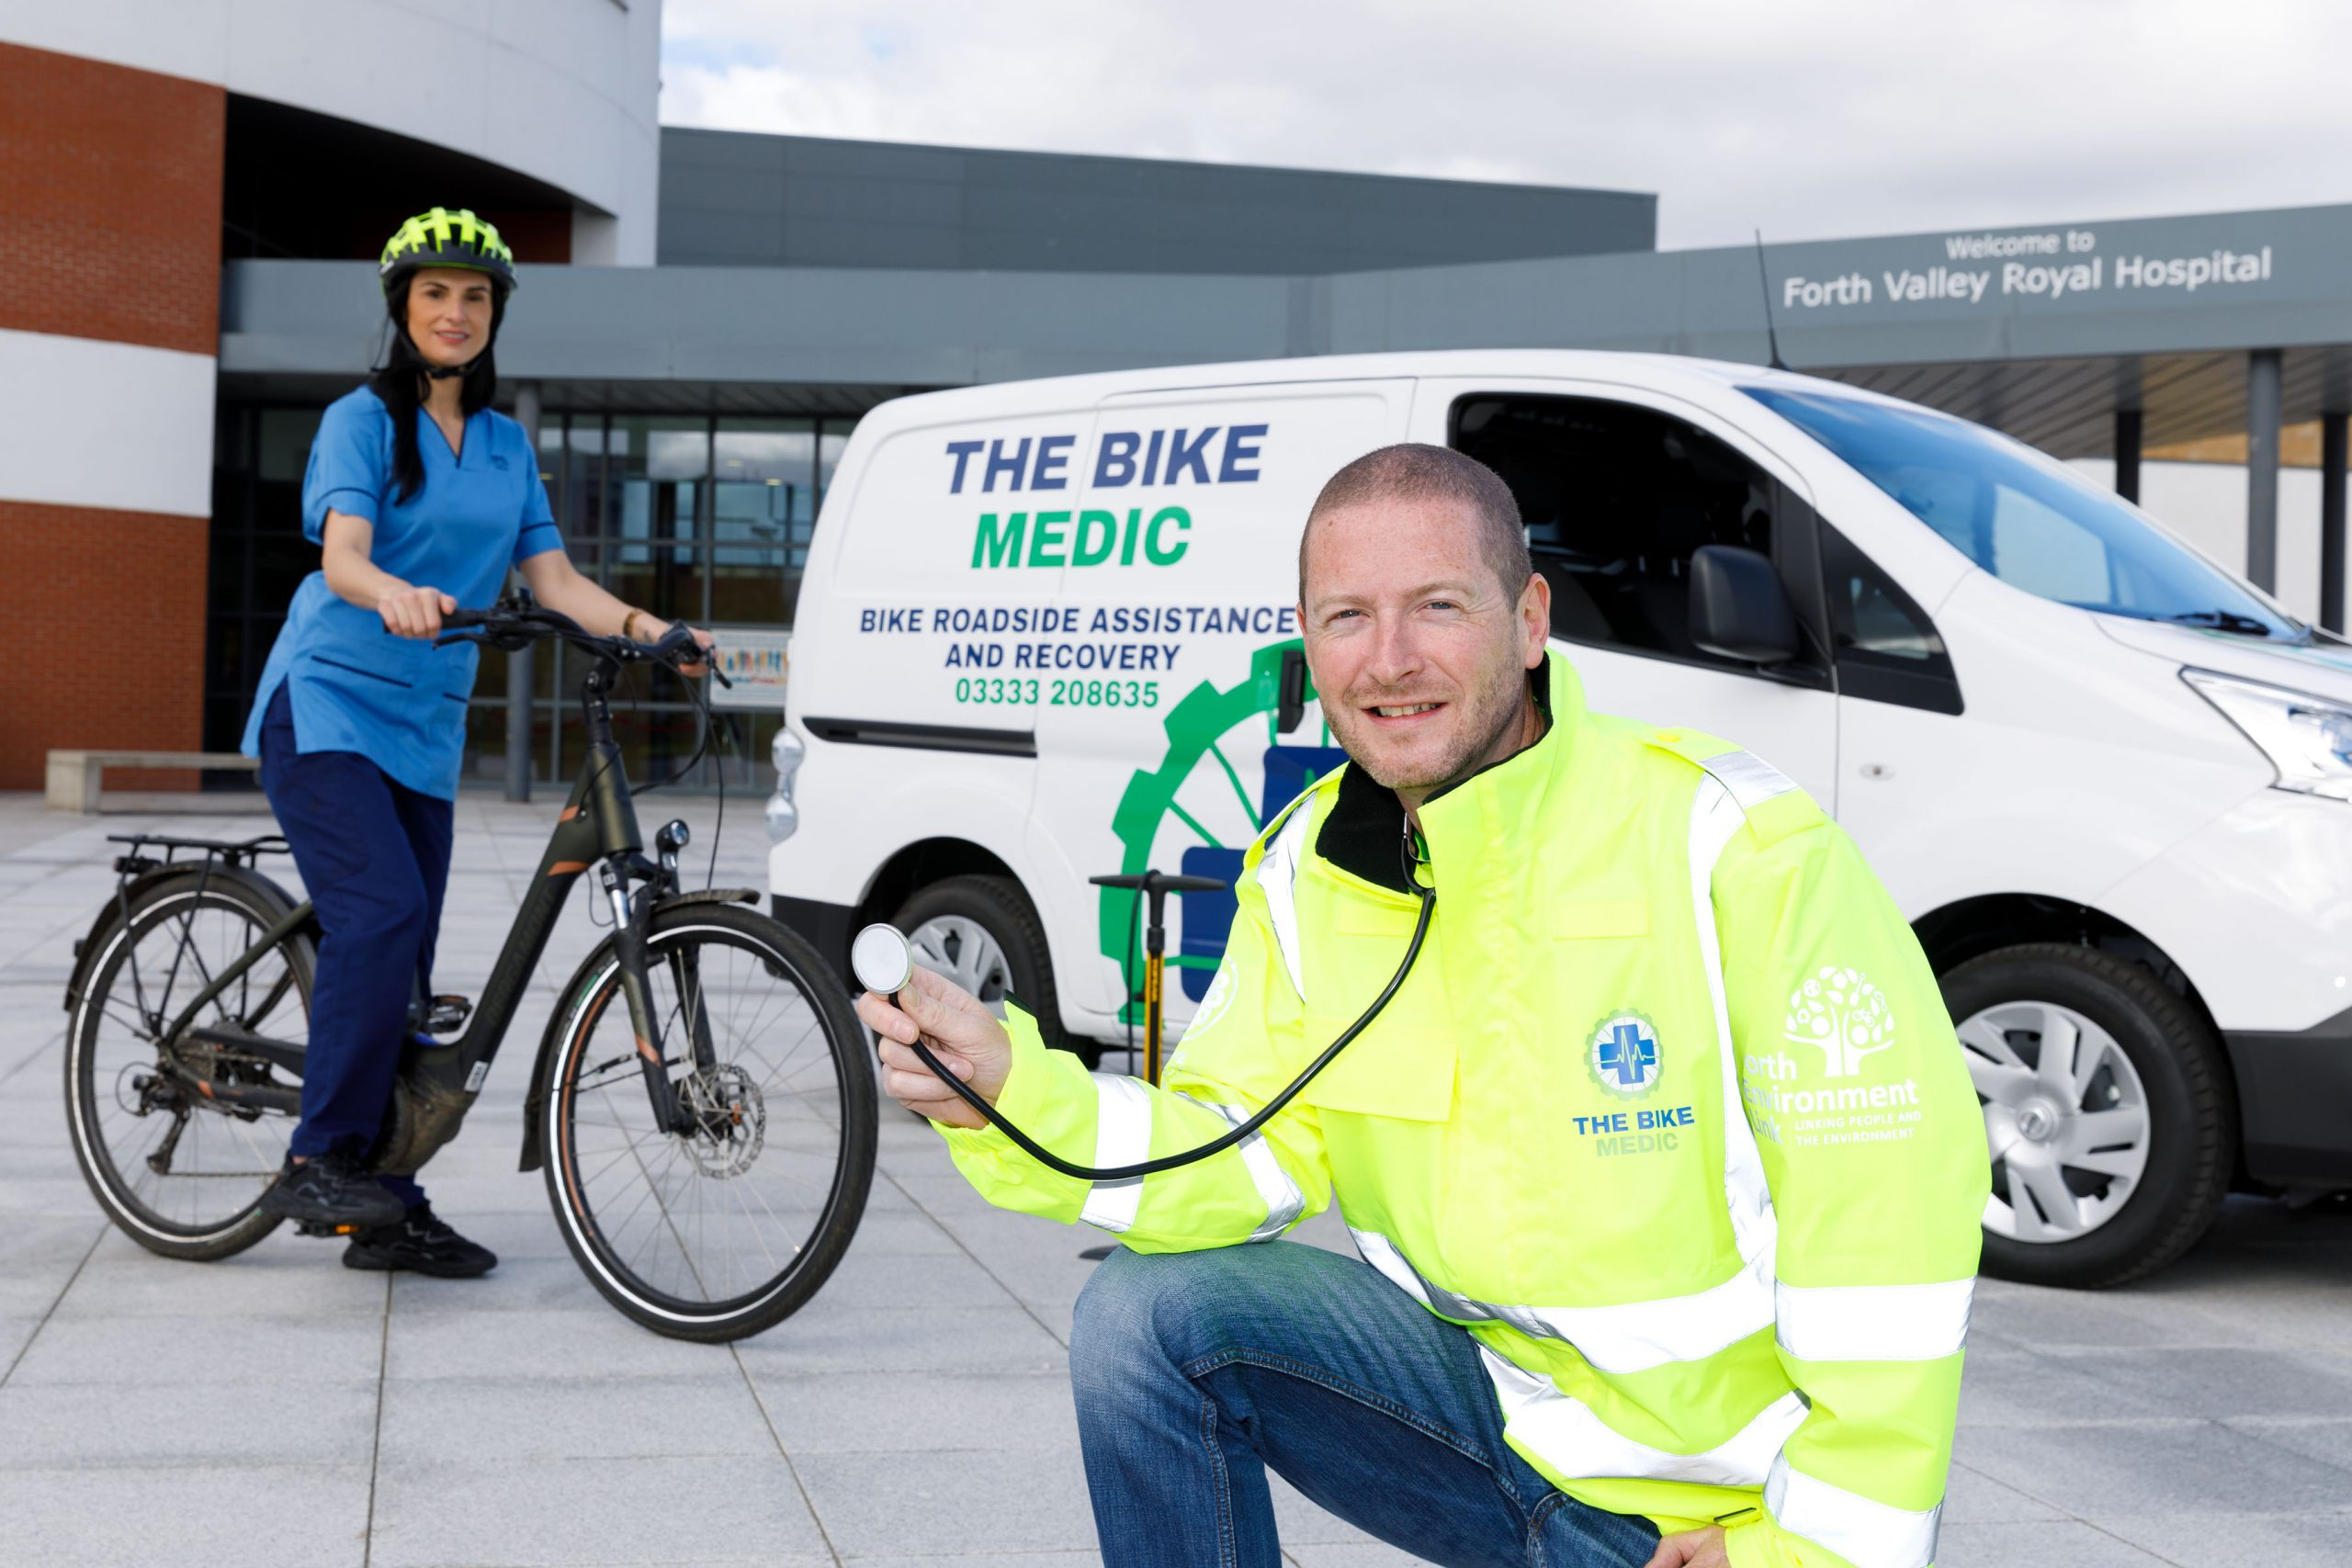 Bike Medic Ray Burr with NHS nurse Varrie-Jane France